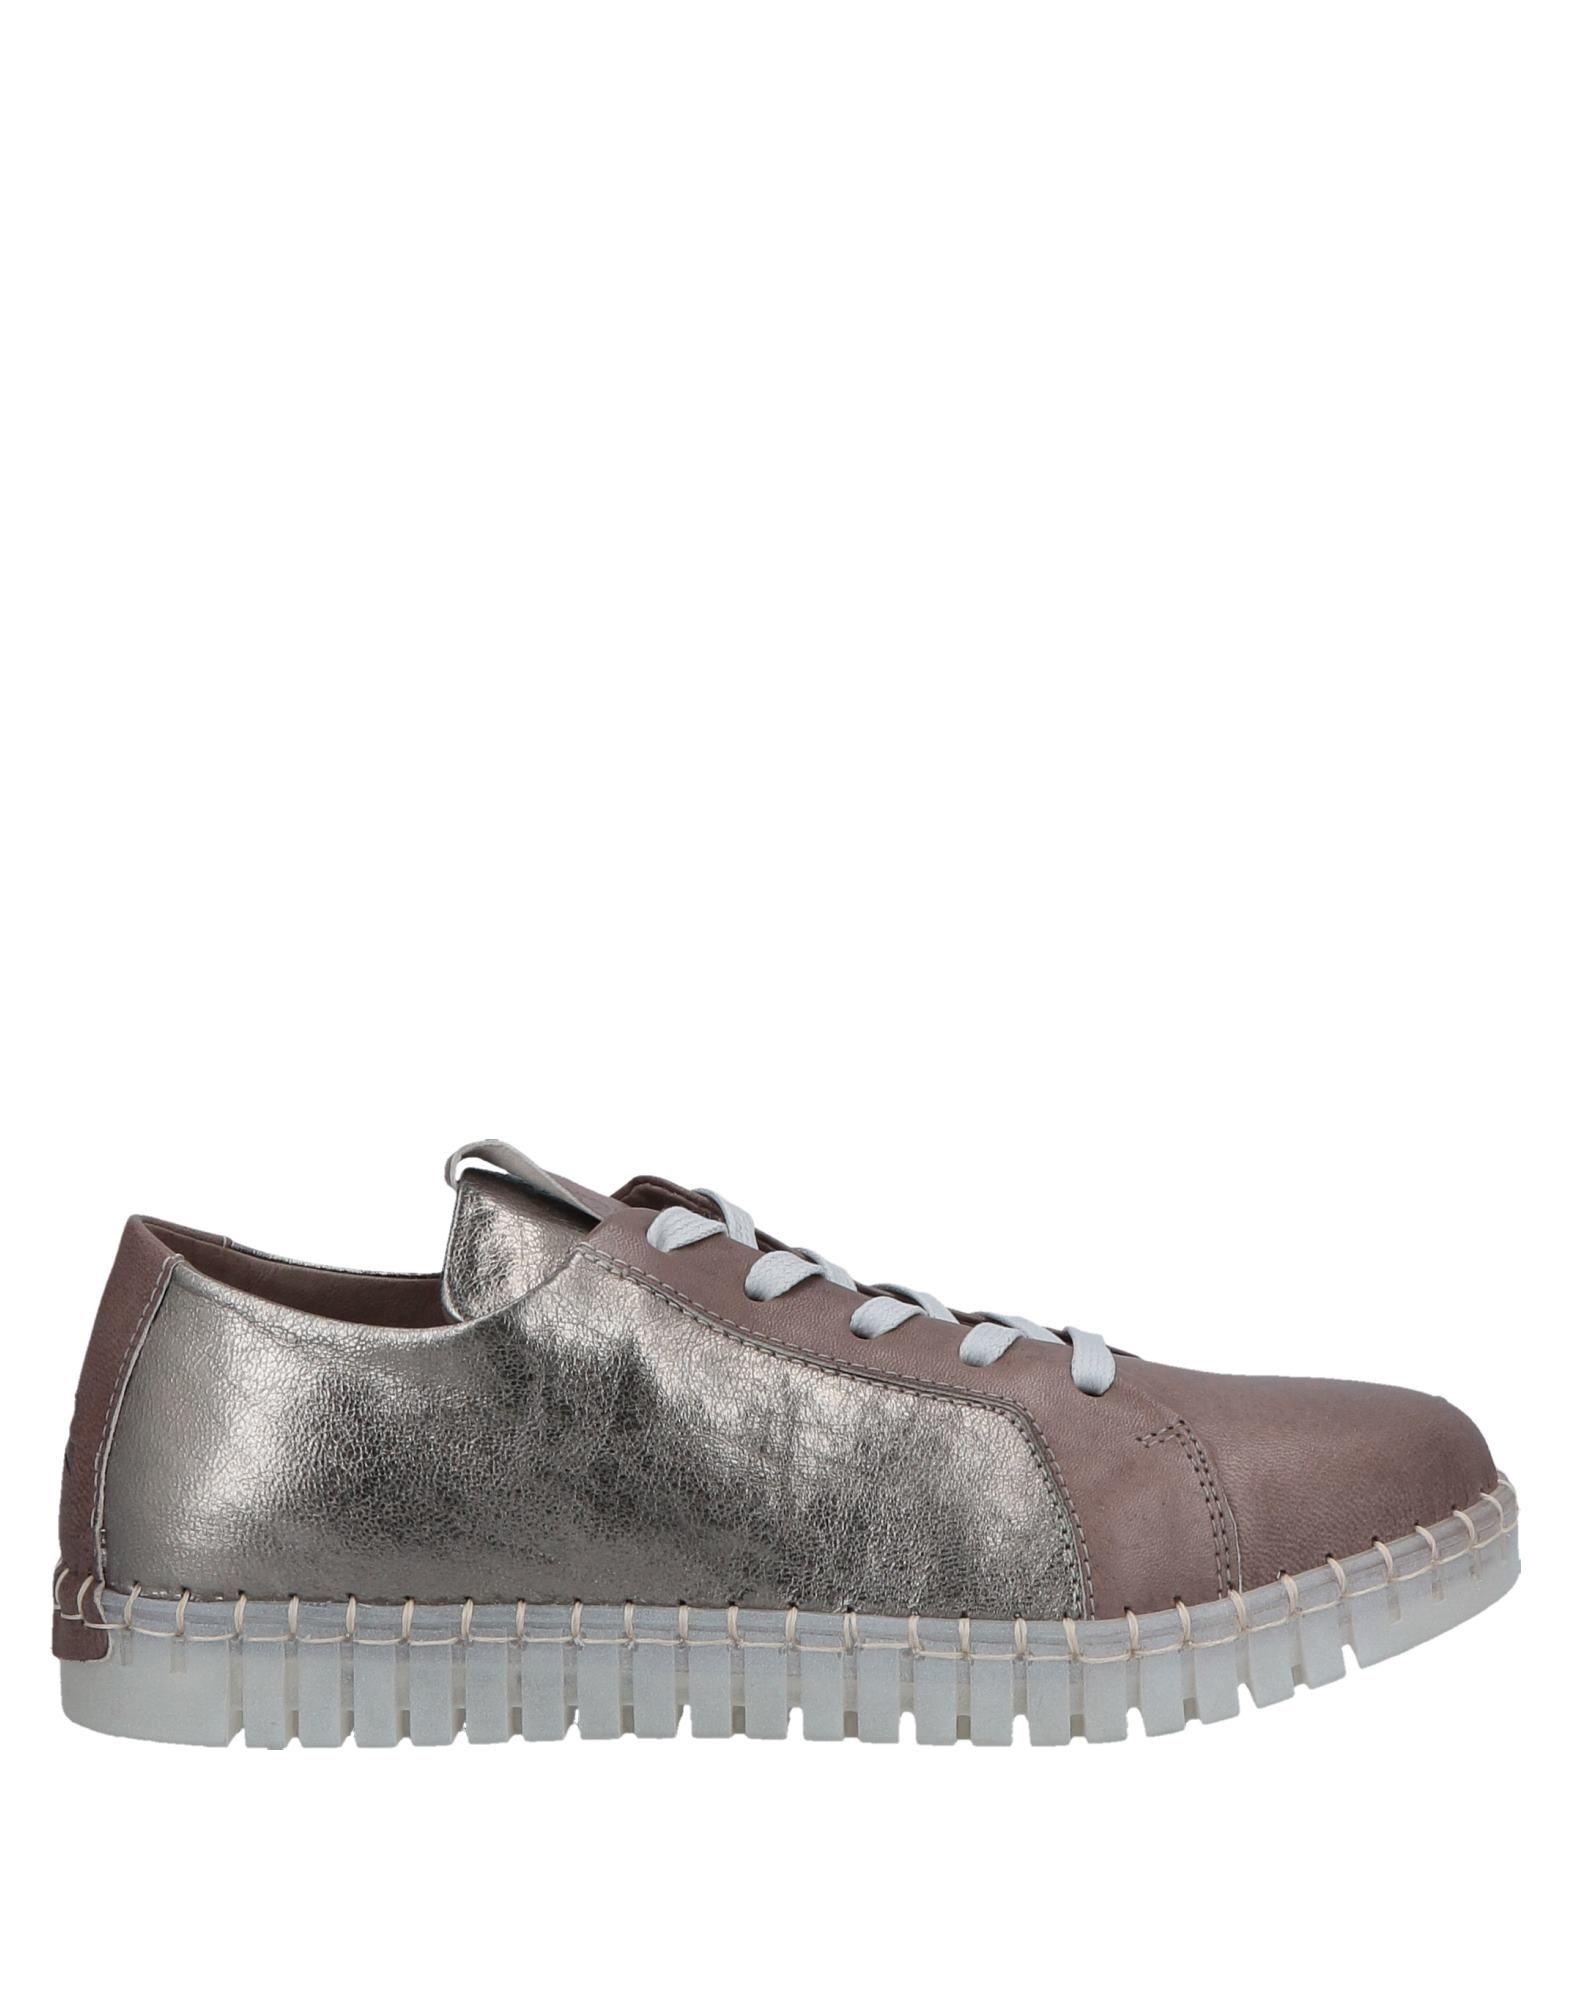 Caqui Caqui Caqui Zapatillas Andìa Fora Mujer - Zapatillas Andìa Fora Zapatos casuales salvajes f57805